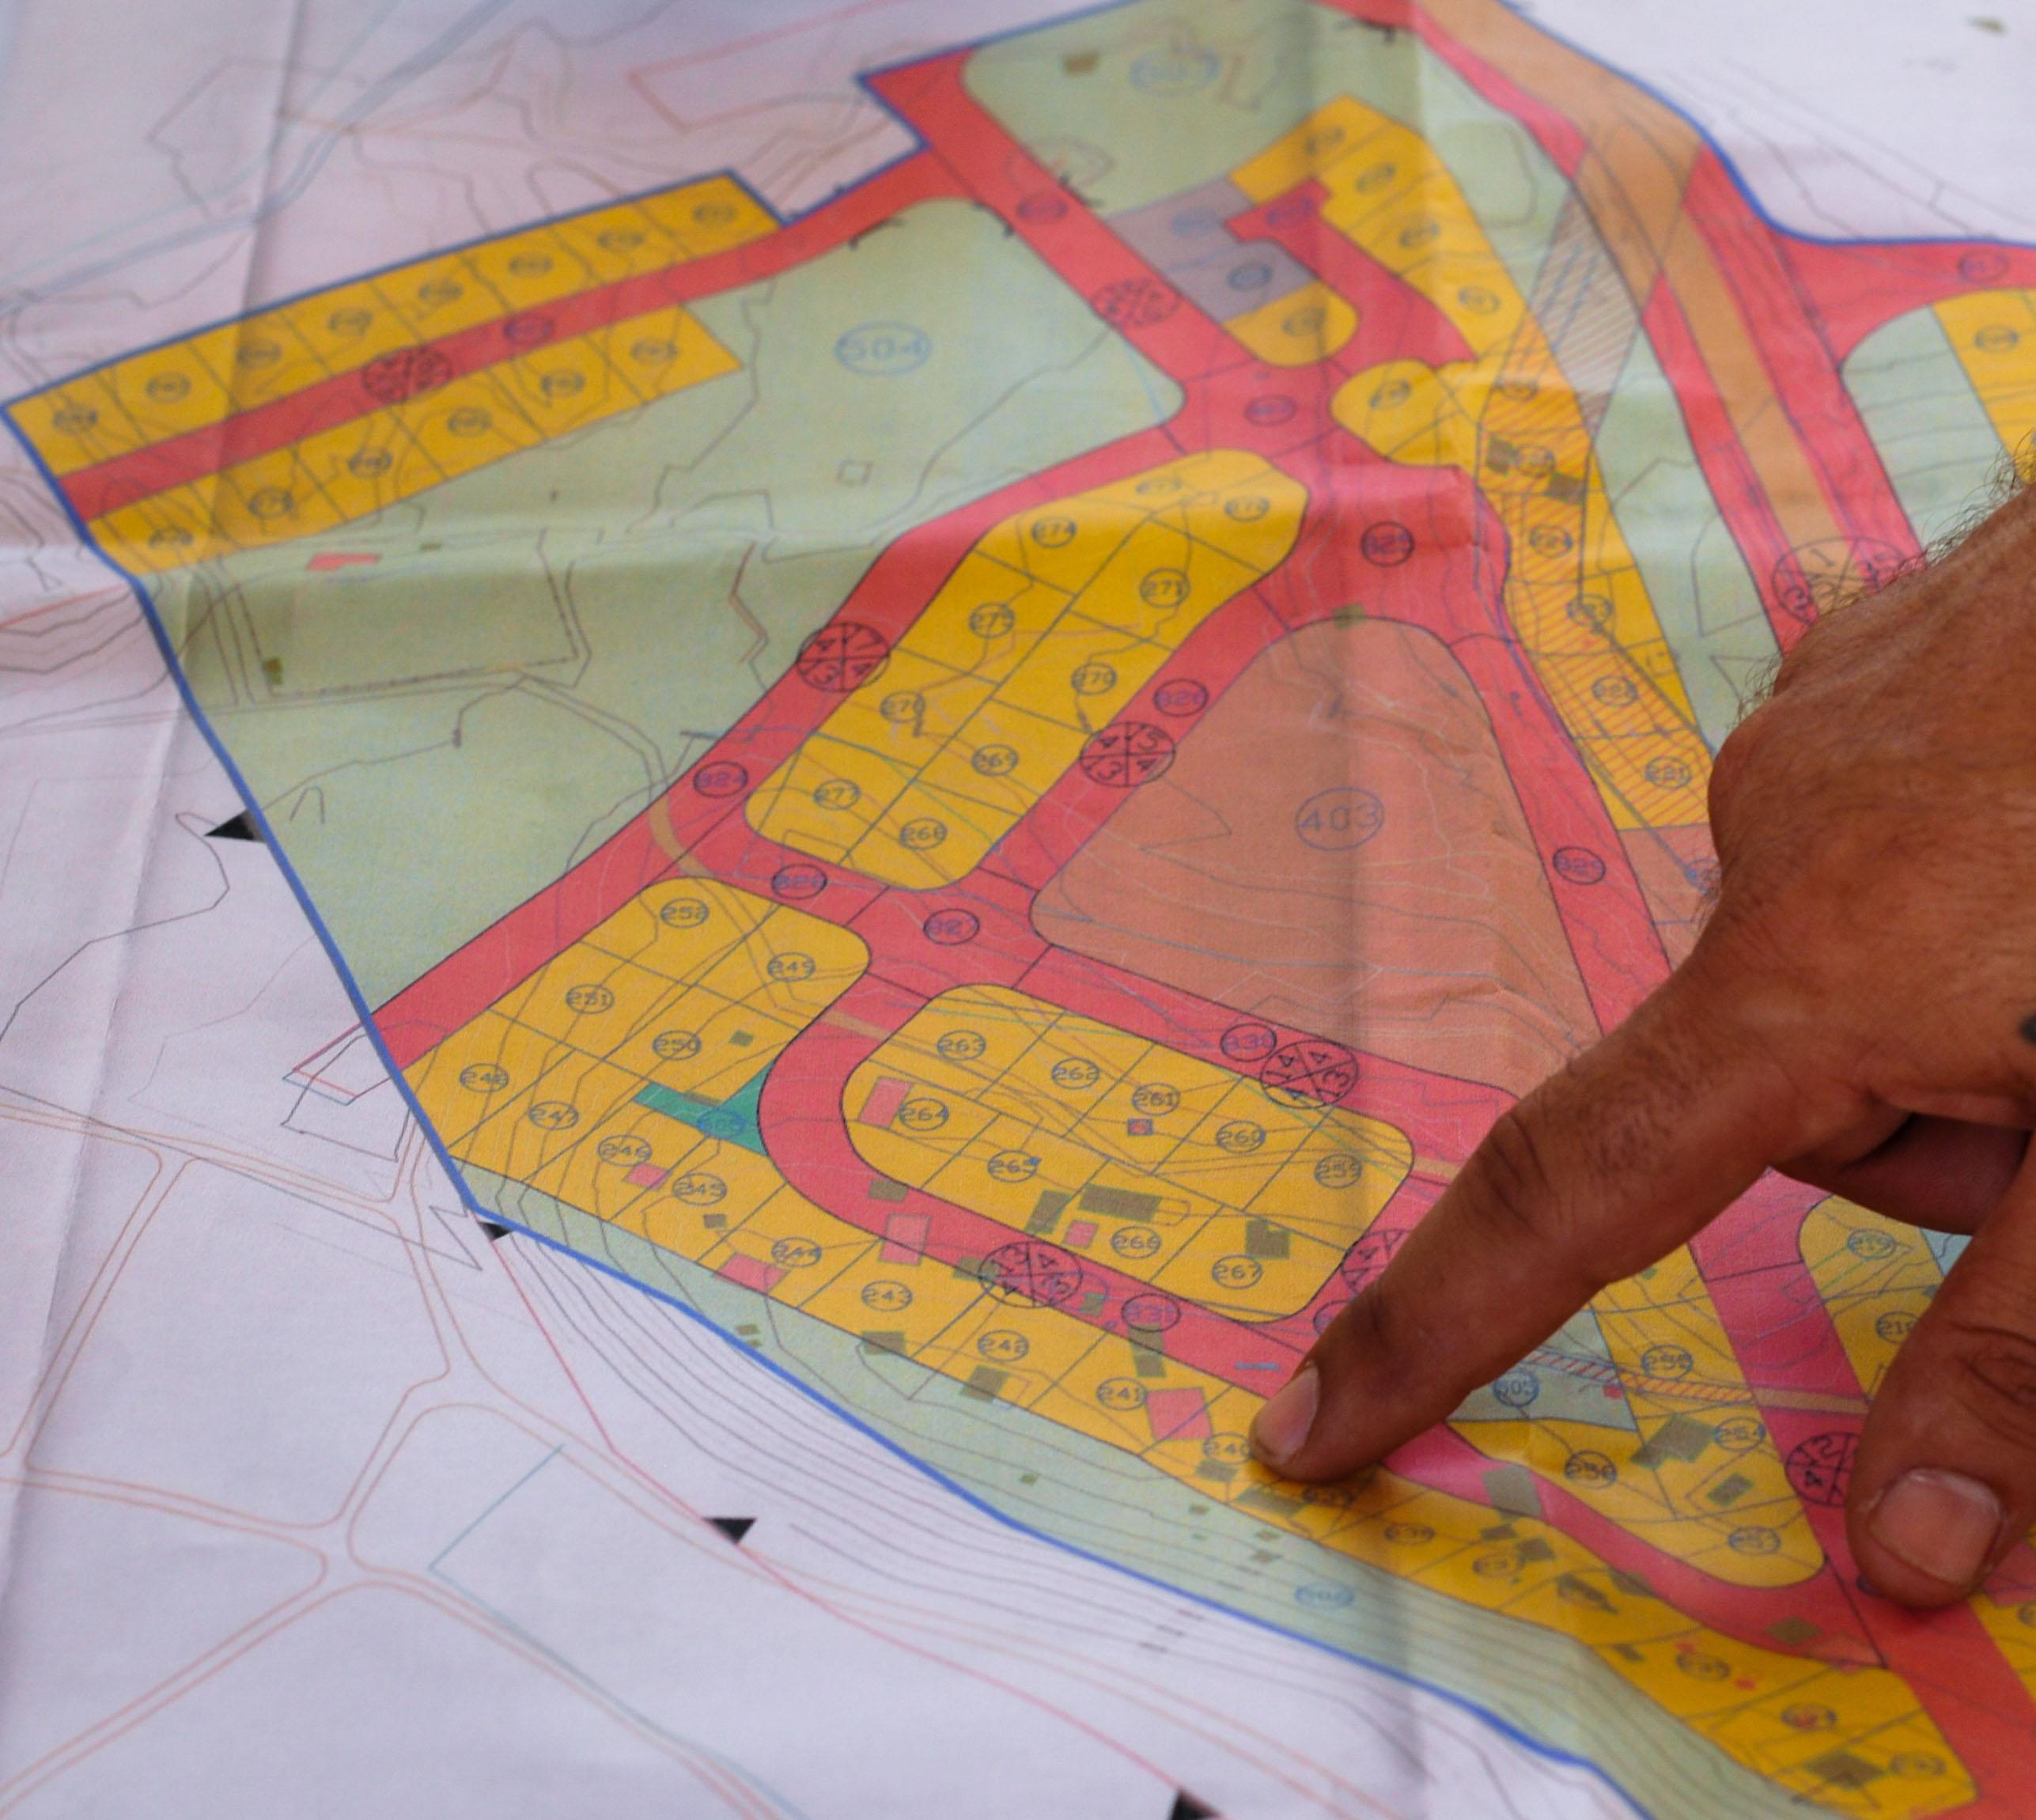 bgsaltnes nuwai u0027ma map 500 sqm plots for houses 2014 09 13